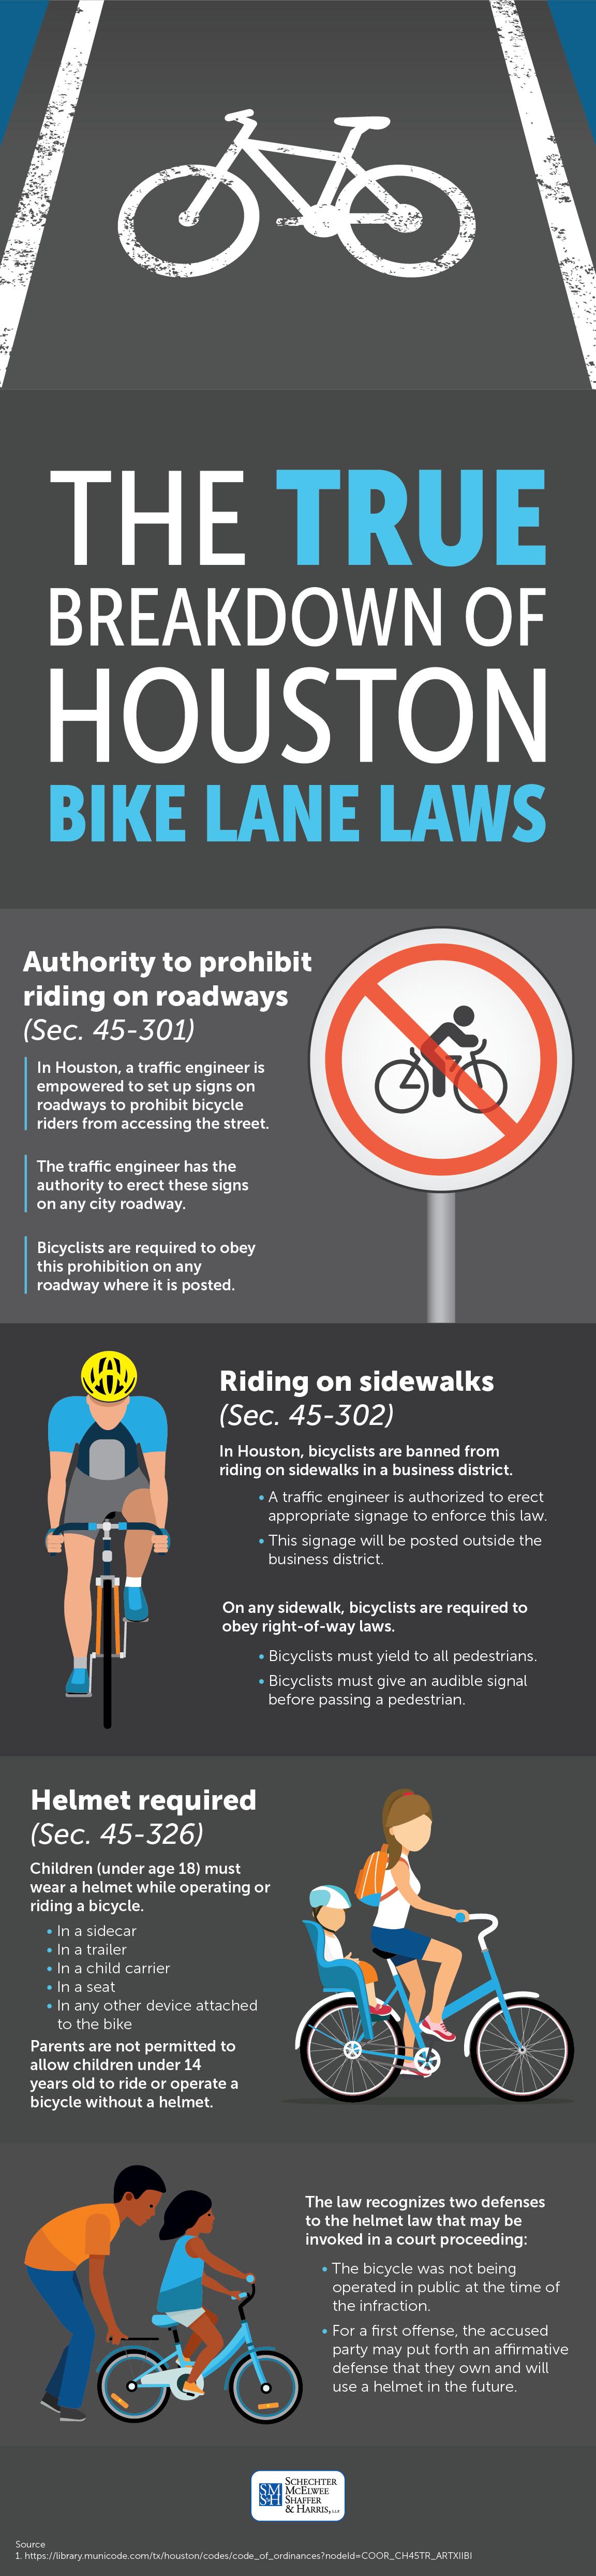 Houston Bike Lane Laws Infographic